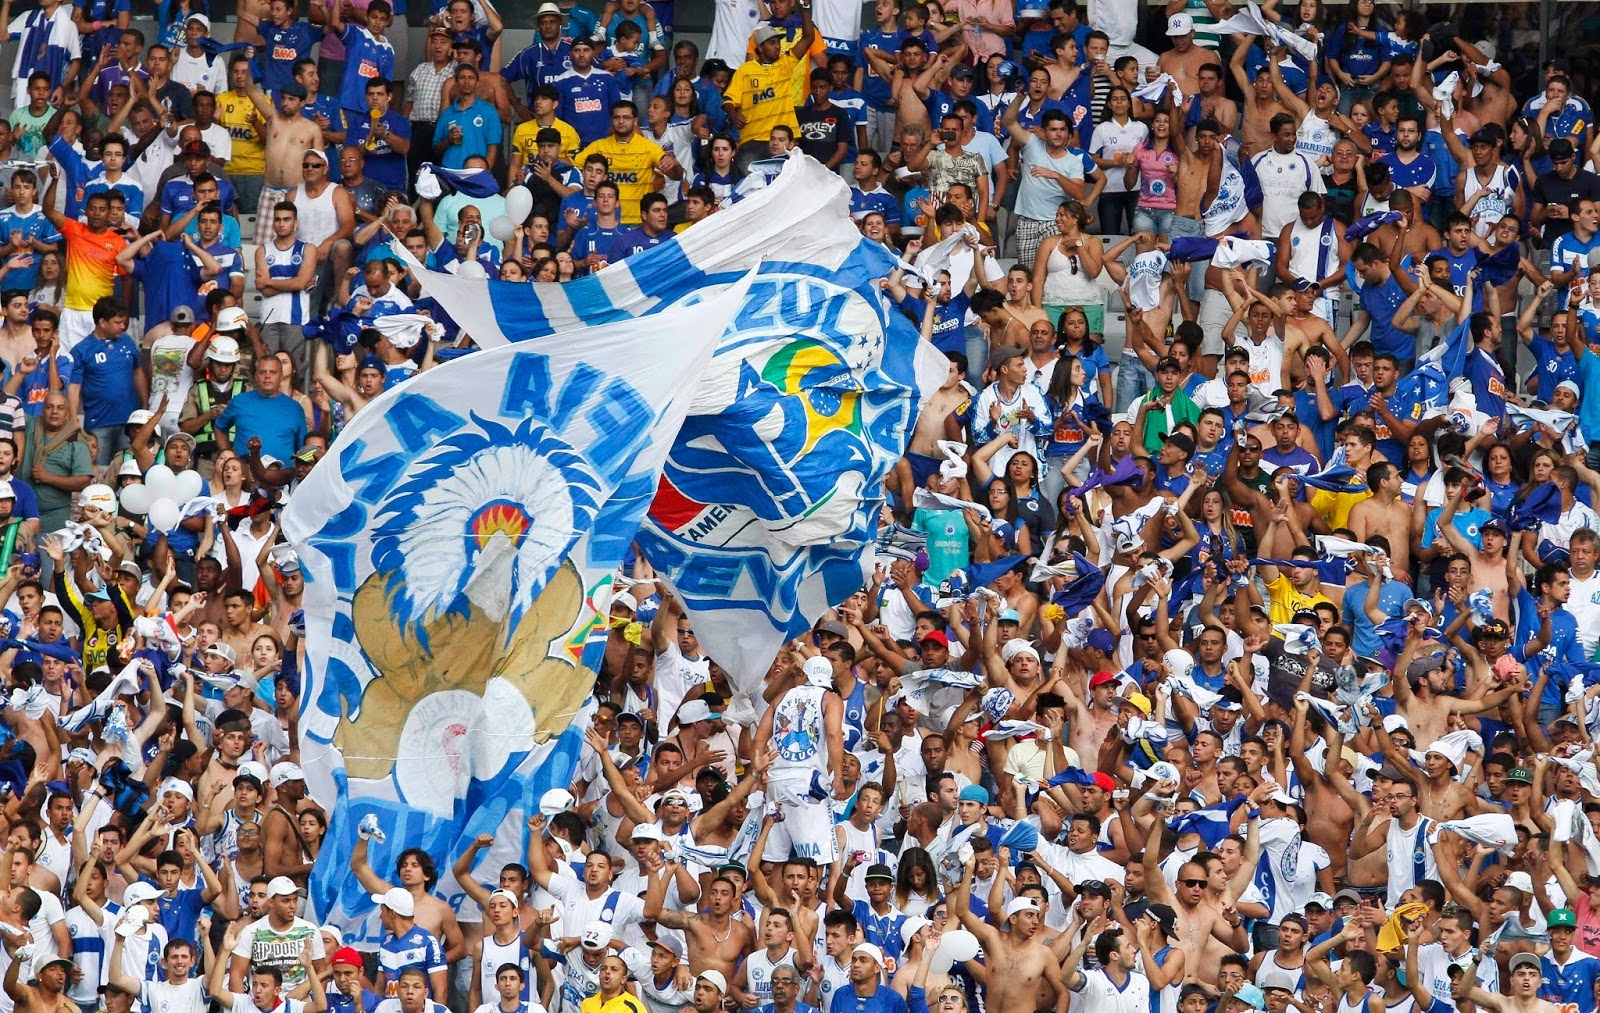 Torcida cruzeirense com bandeiras no estádio